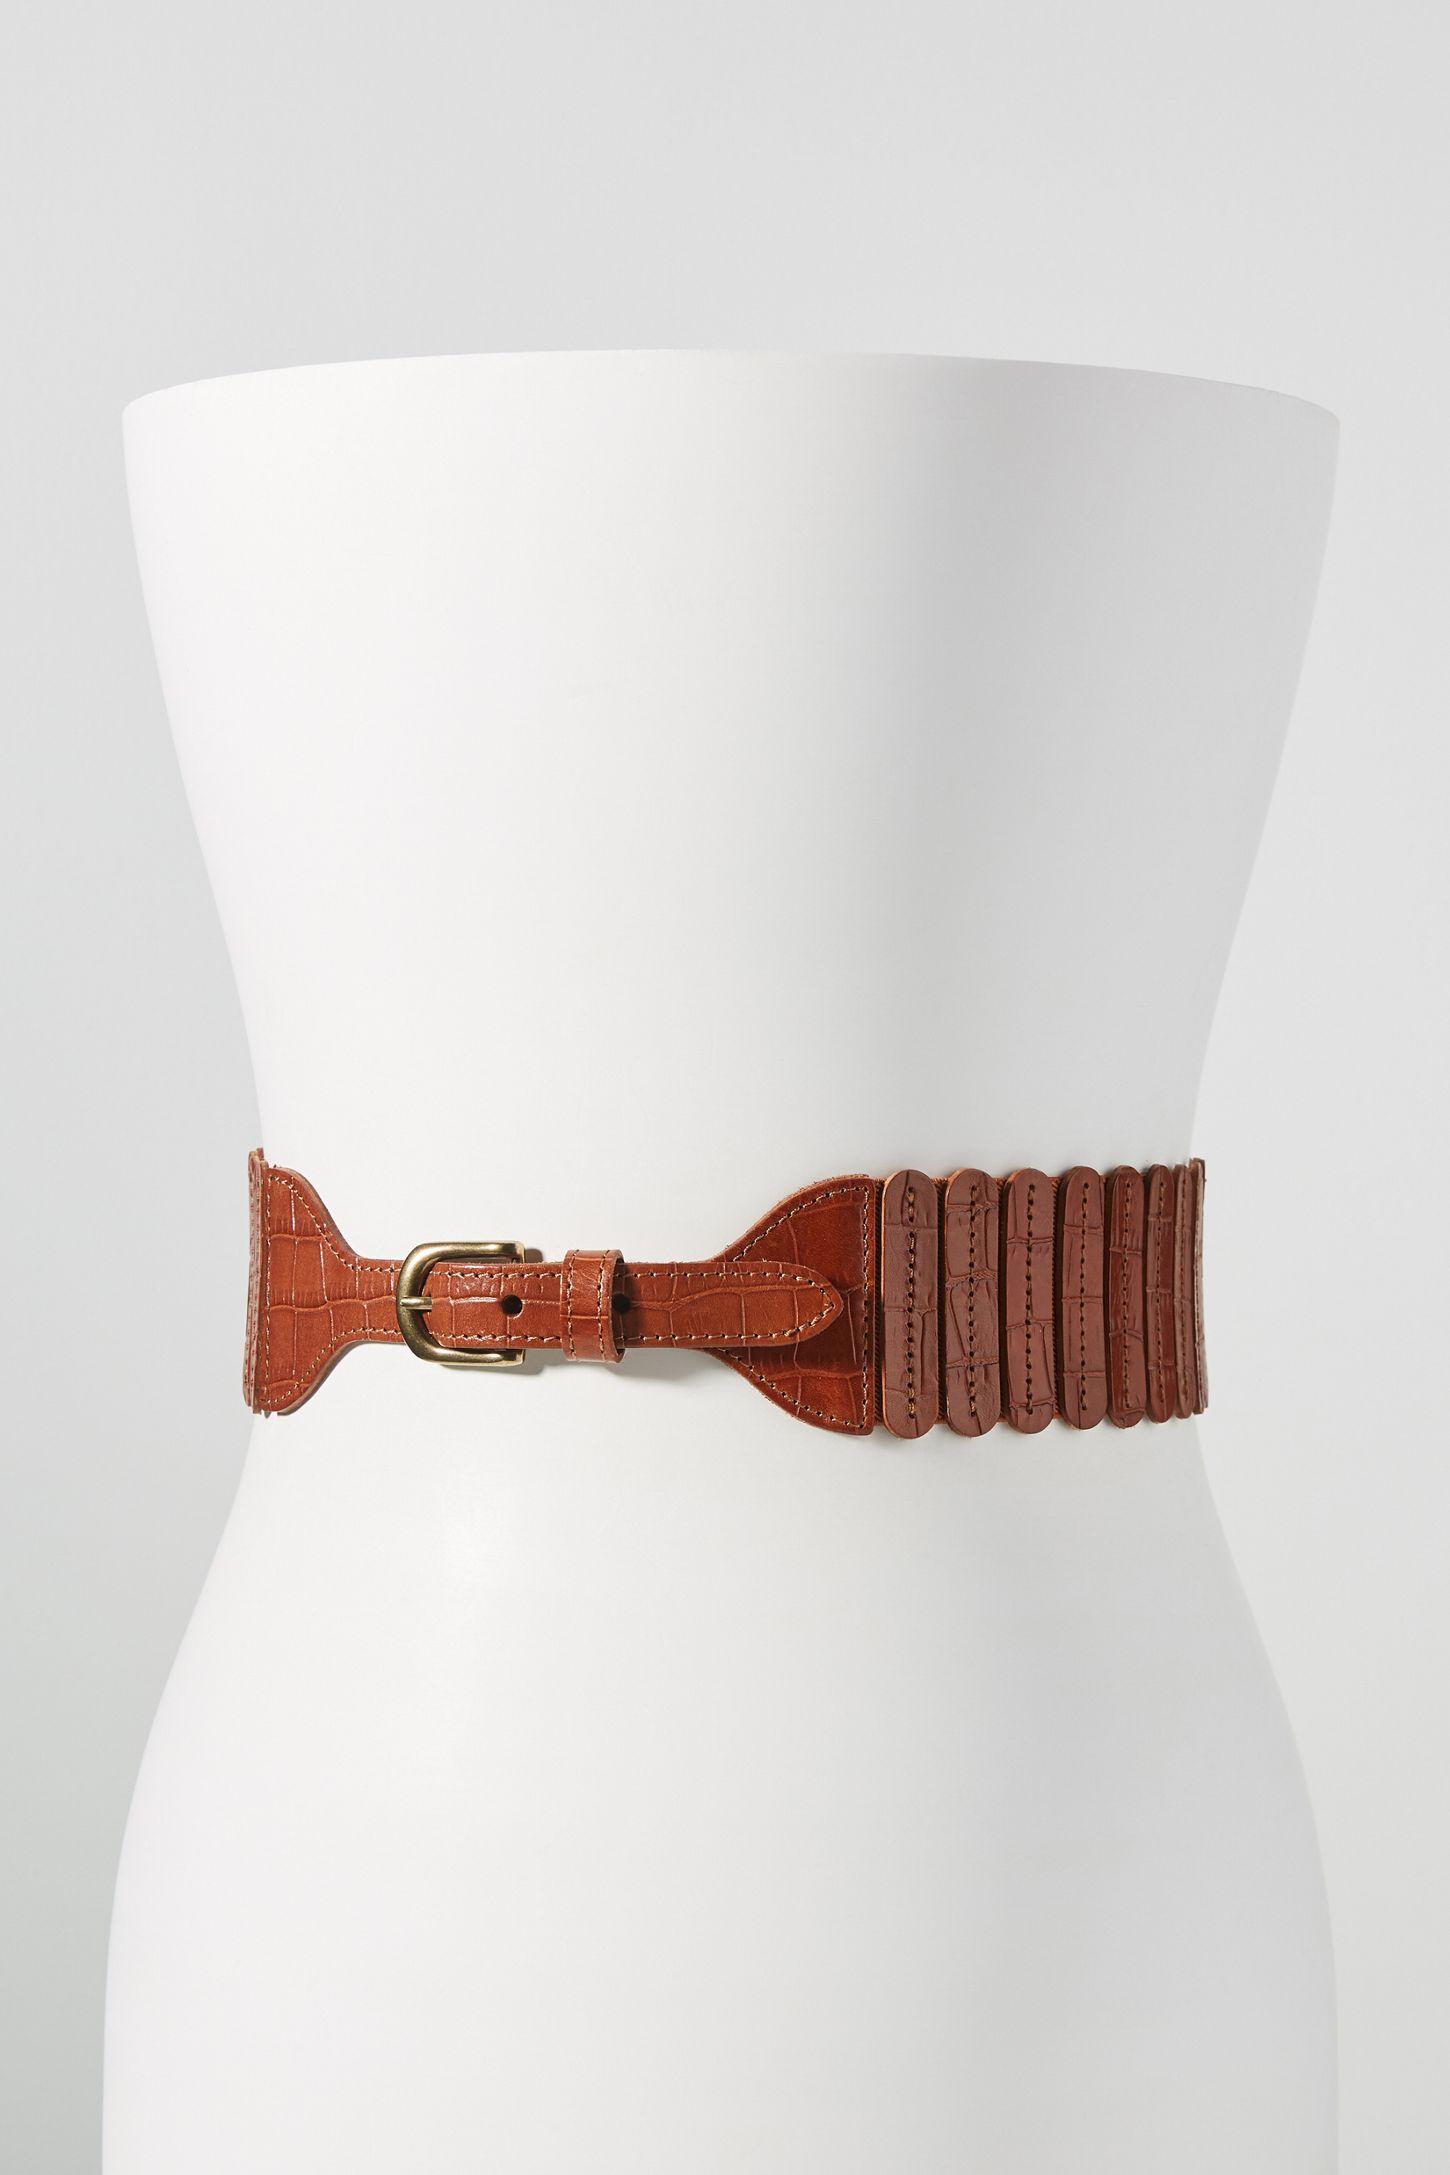 417badd3a21e6 Tabby Stretch Waist Belt | Anthropologie